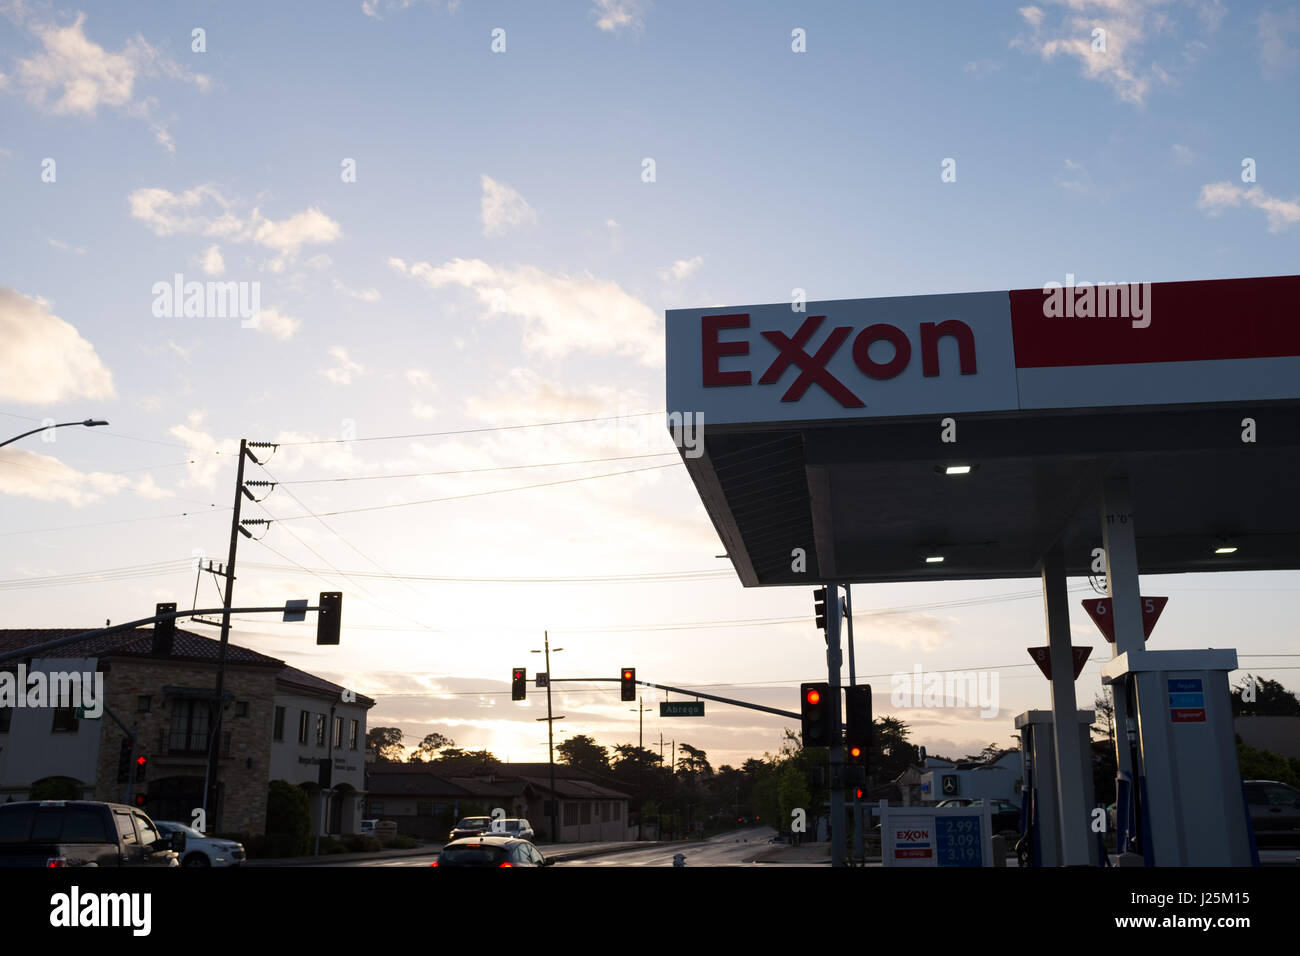 Exxon Stock Photos Amp Exxon Stock Images Alamy